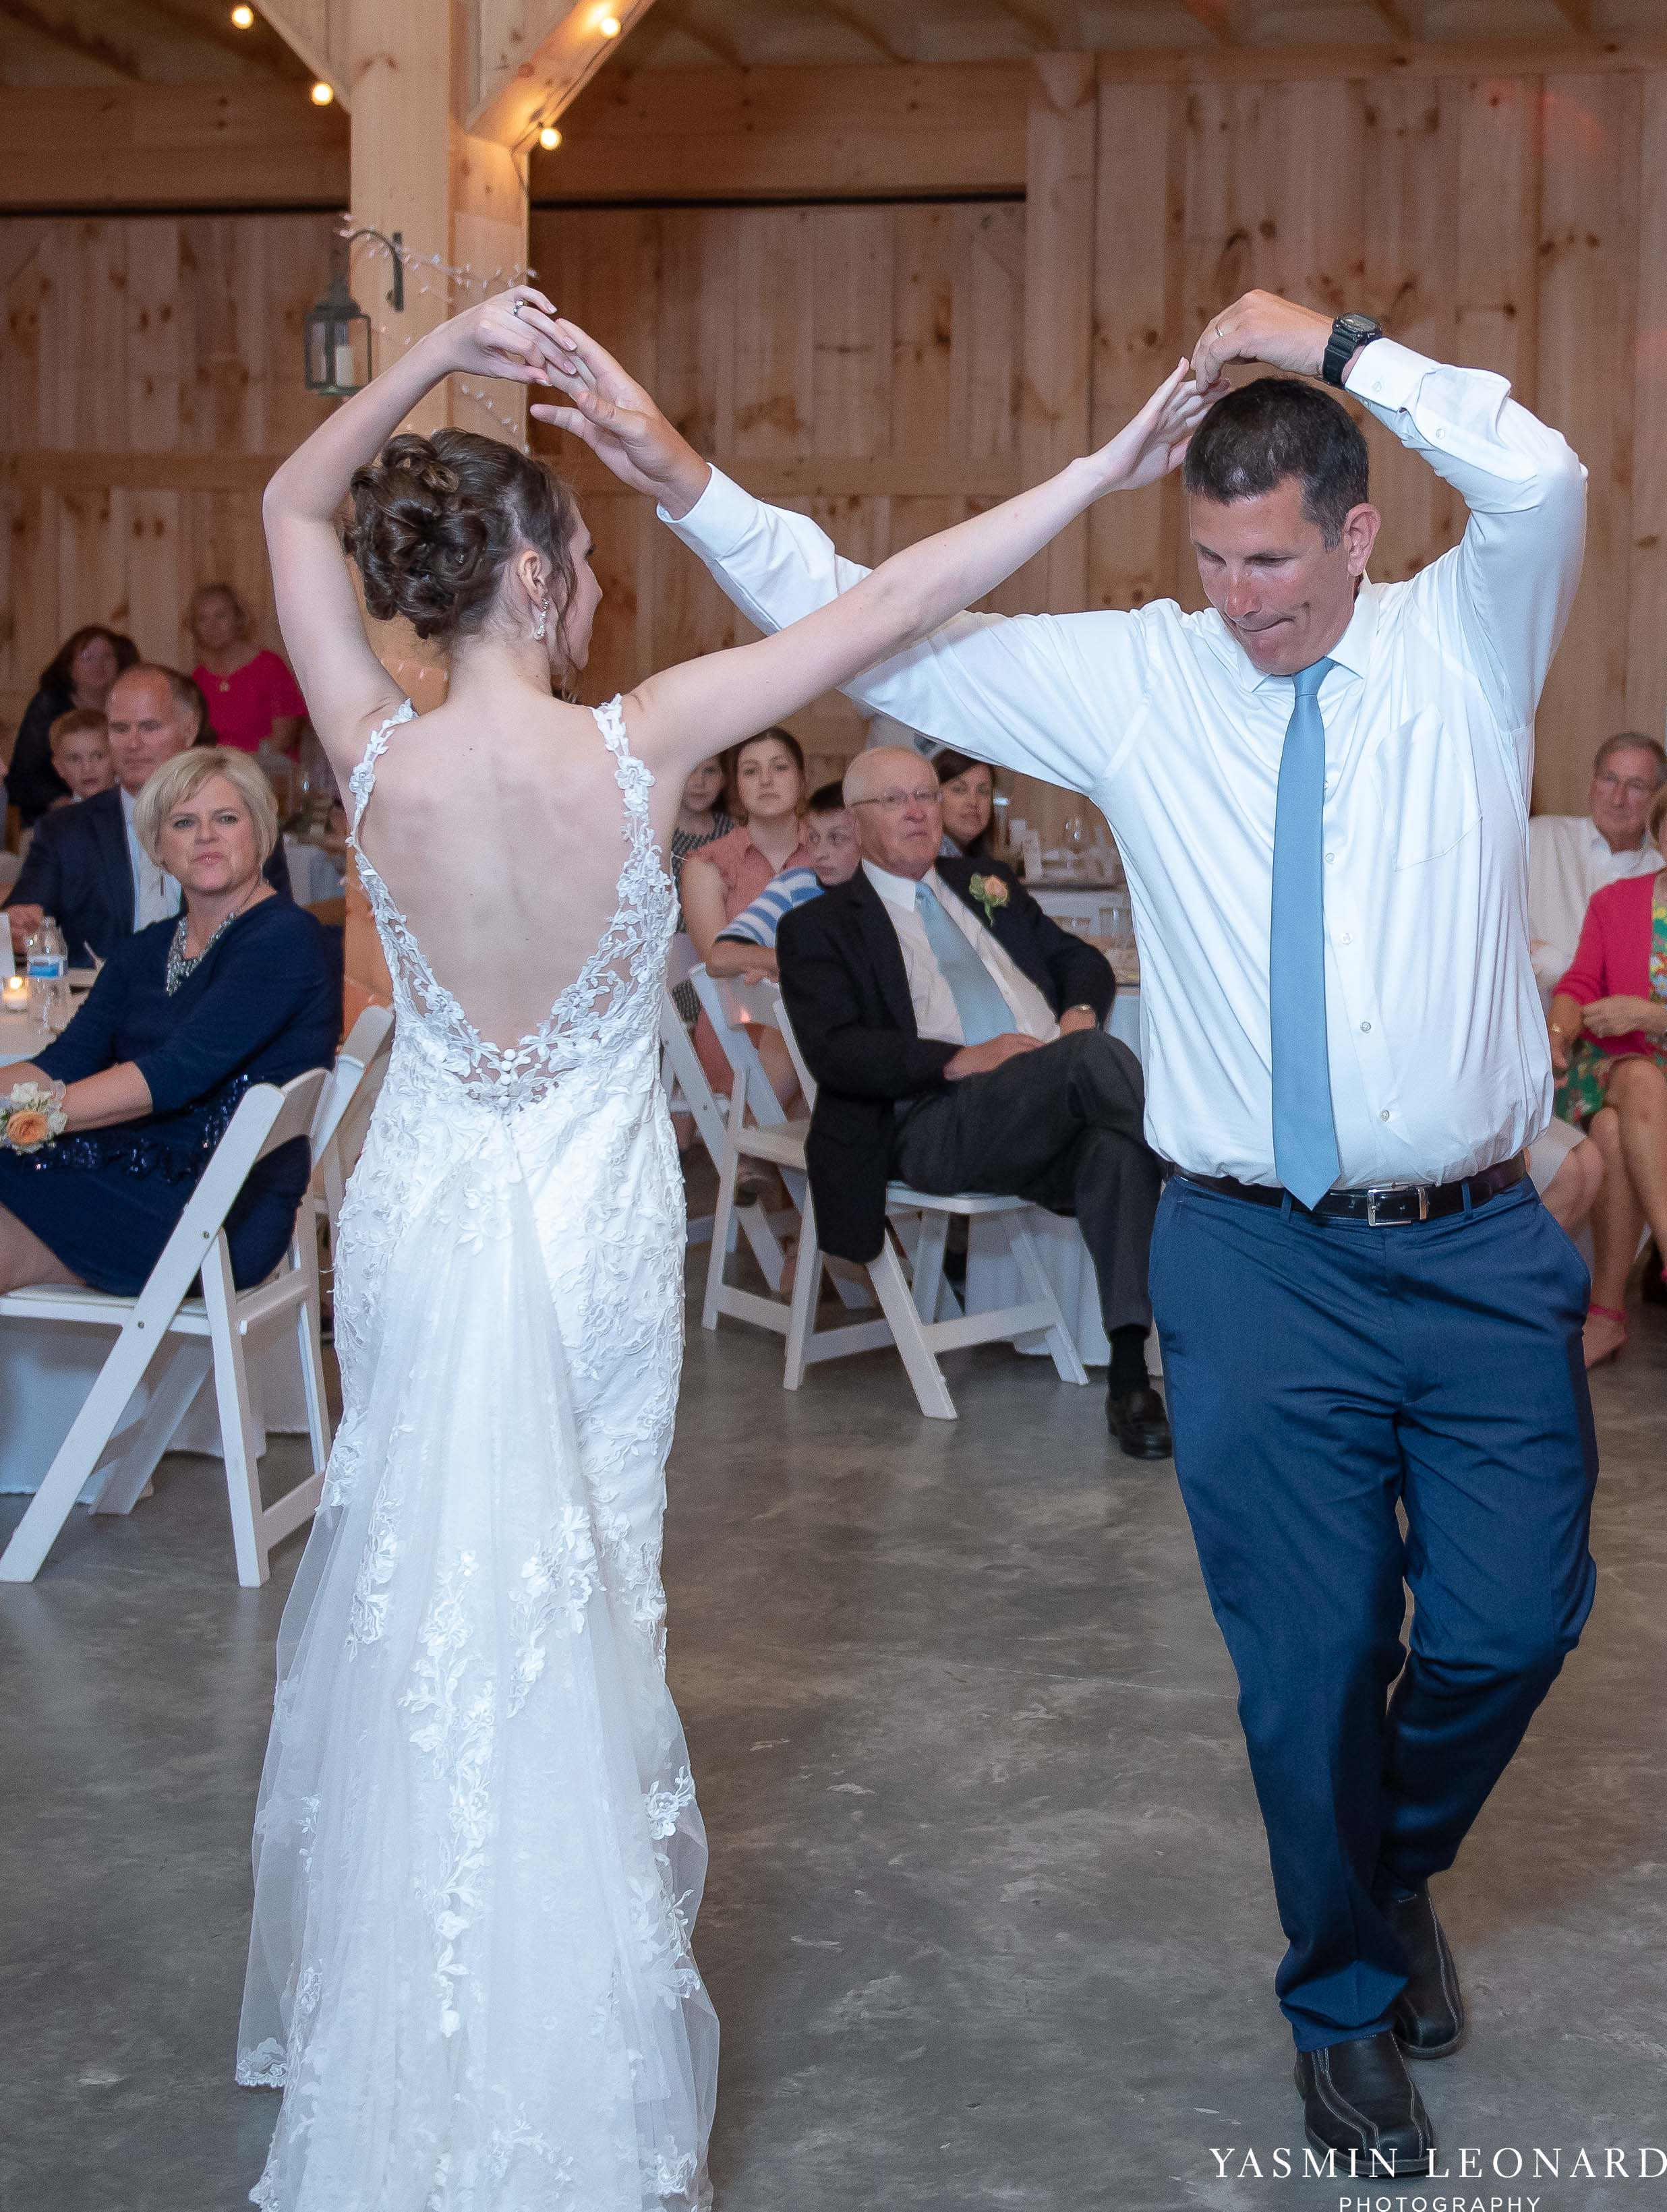 Old Homeplace Vineyard - NC Weddings - Outdoor Summer Weddings - Peony Boutique - Vineyard Wedding - NC Photographer - Yasmin Leonard Photography-67.jpg